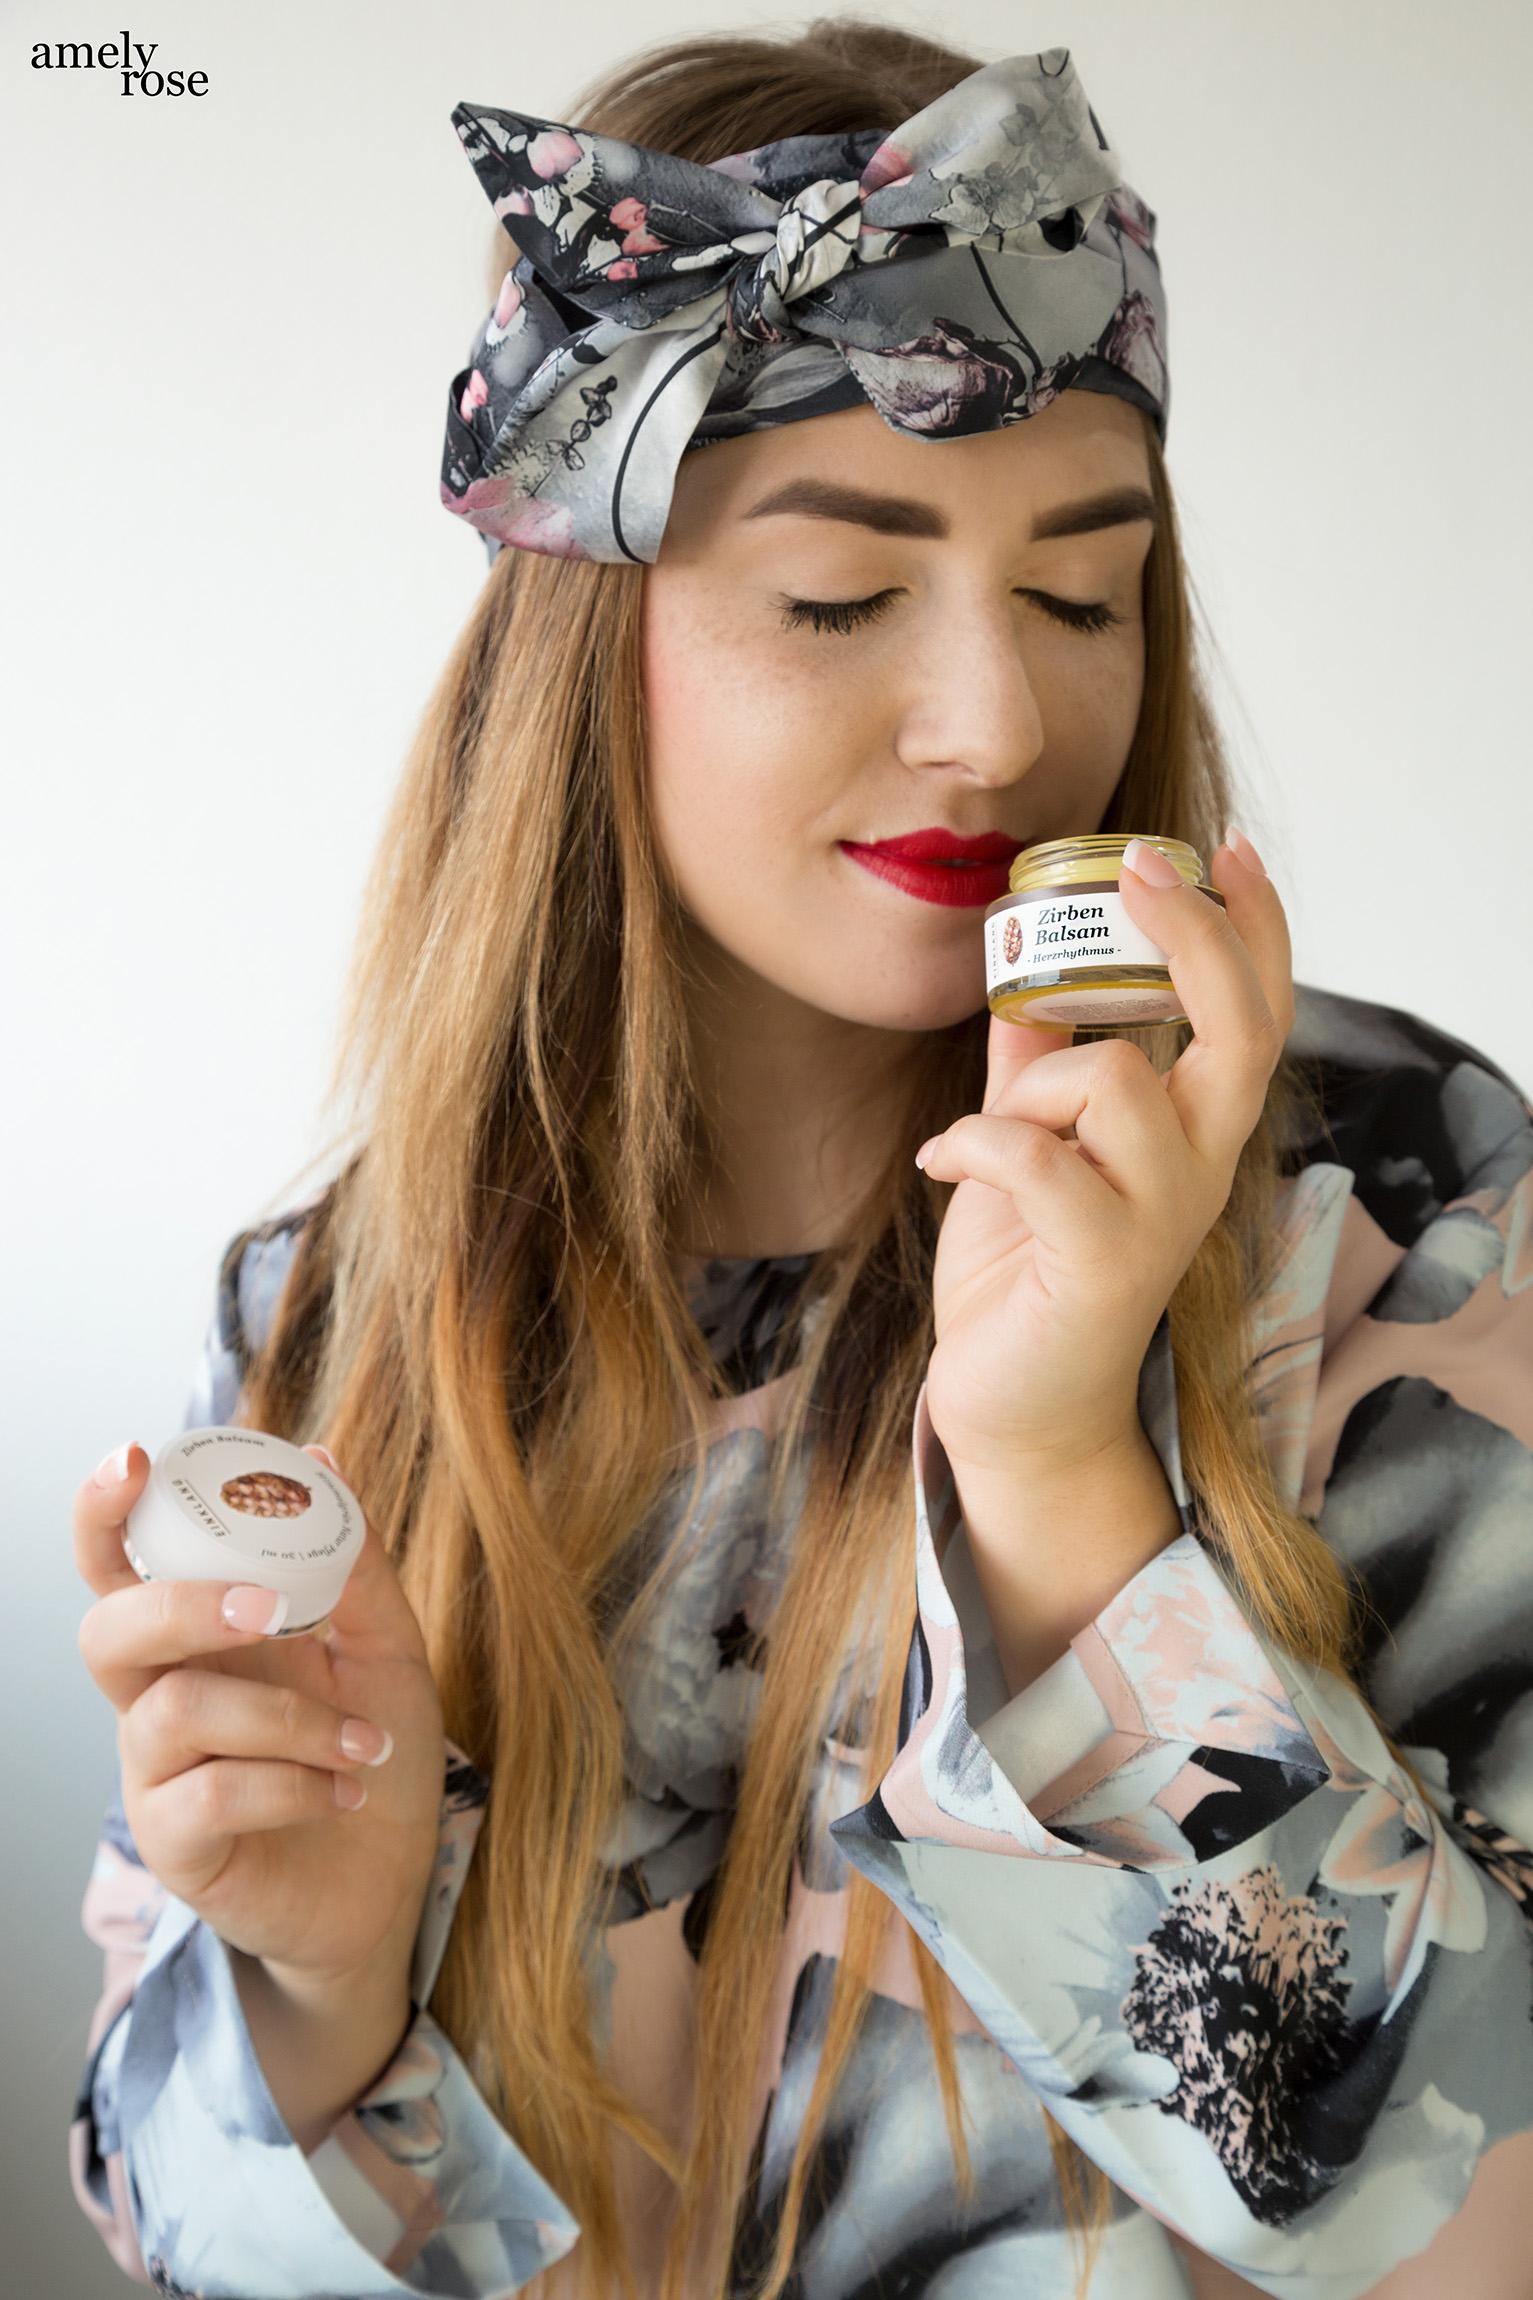 Amely Rose testet vegane Naturkosmetik von Himmelgruen